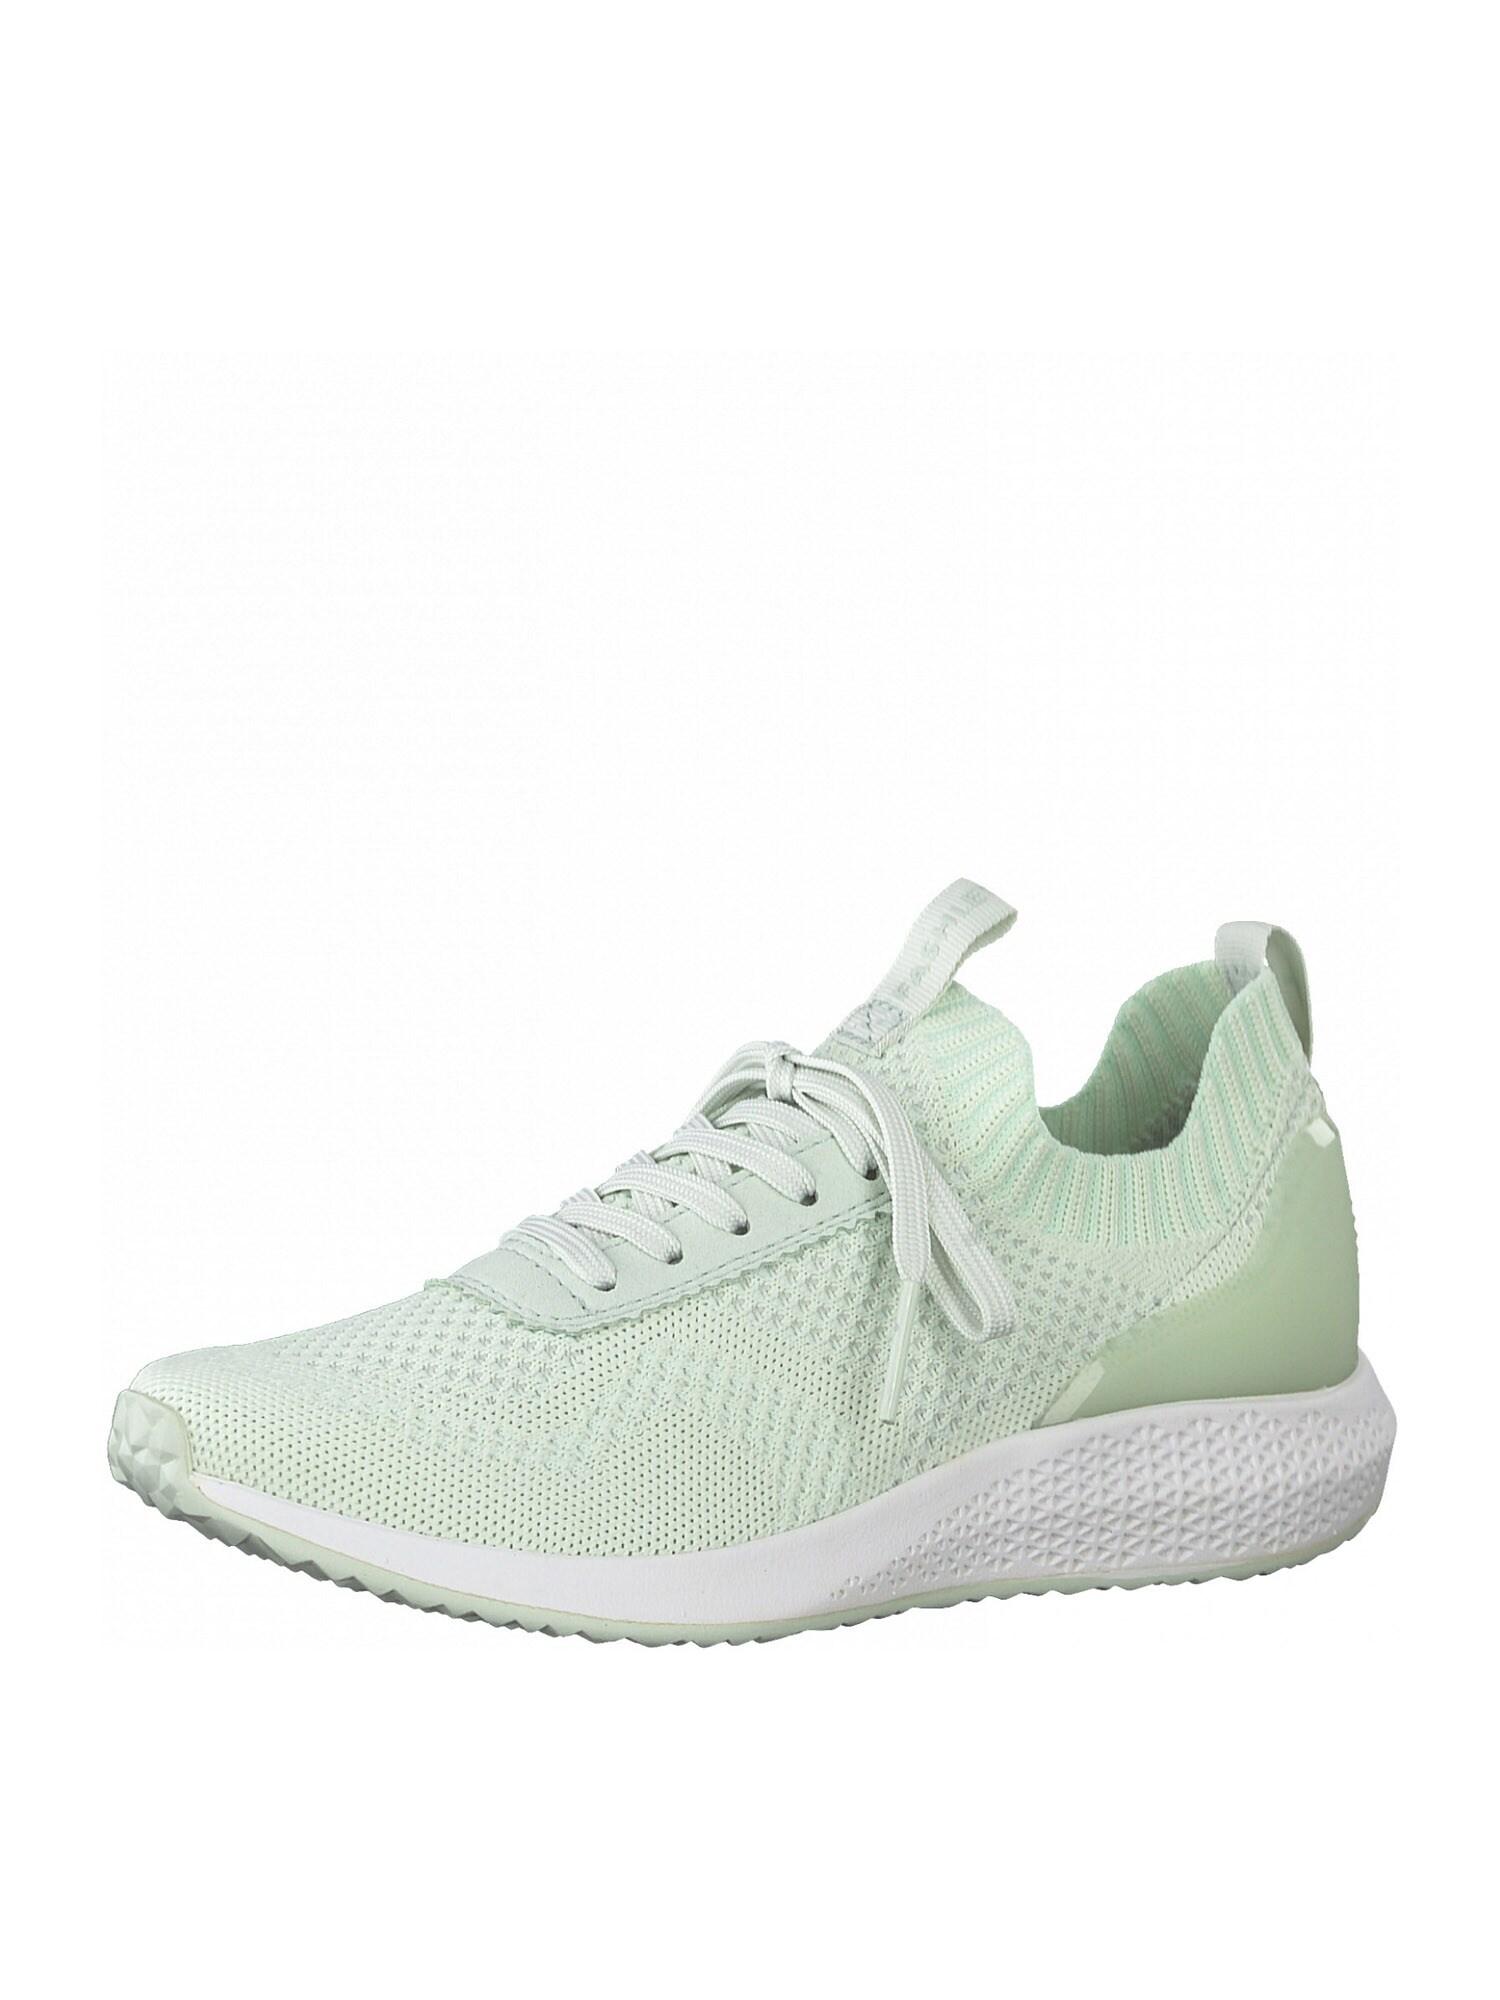 Tamaris Fashletics Sneaker mėtų spalva